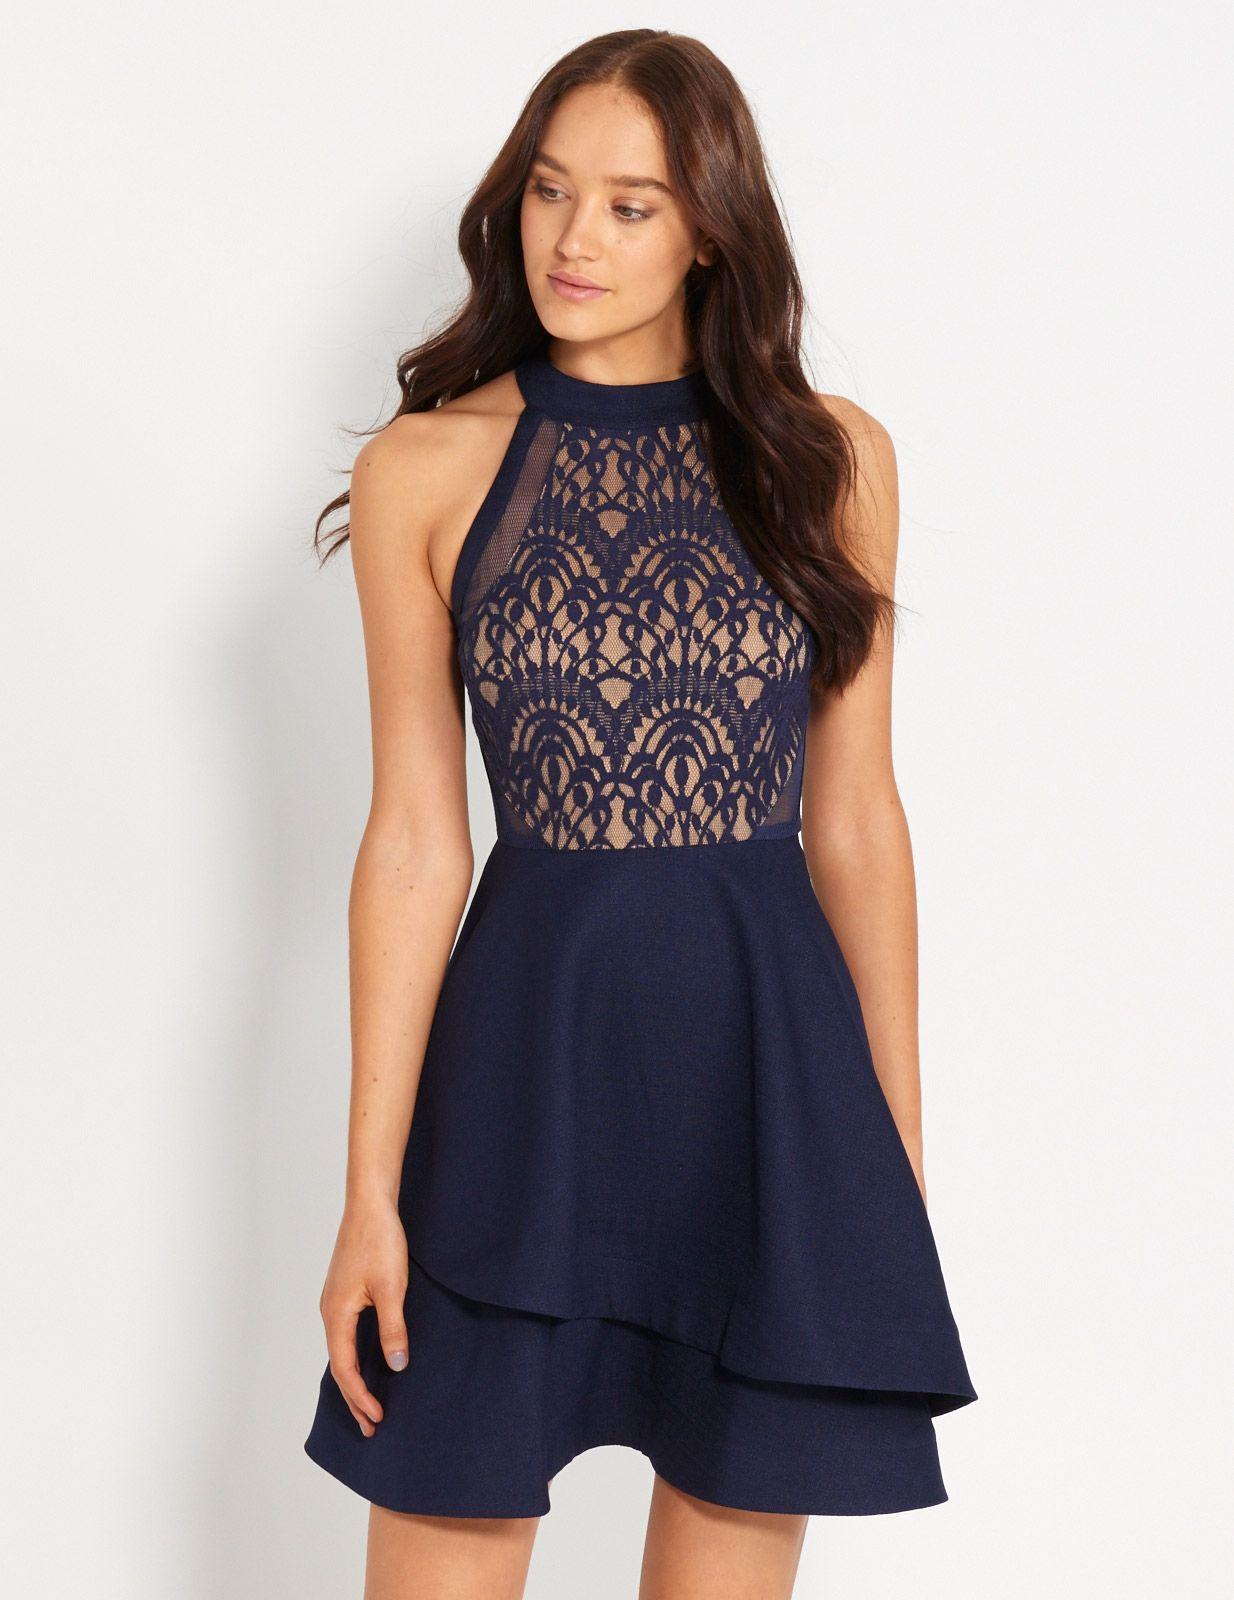 Red Alert Lace Bodice Dress | Dotti | My Wish List ♥ | Pinterest